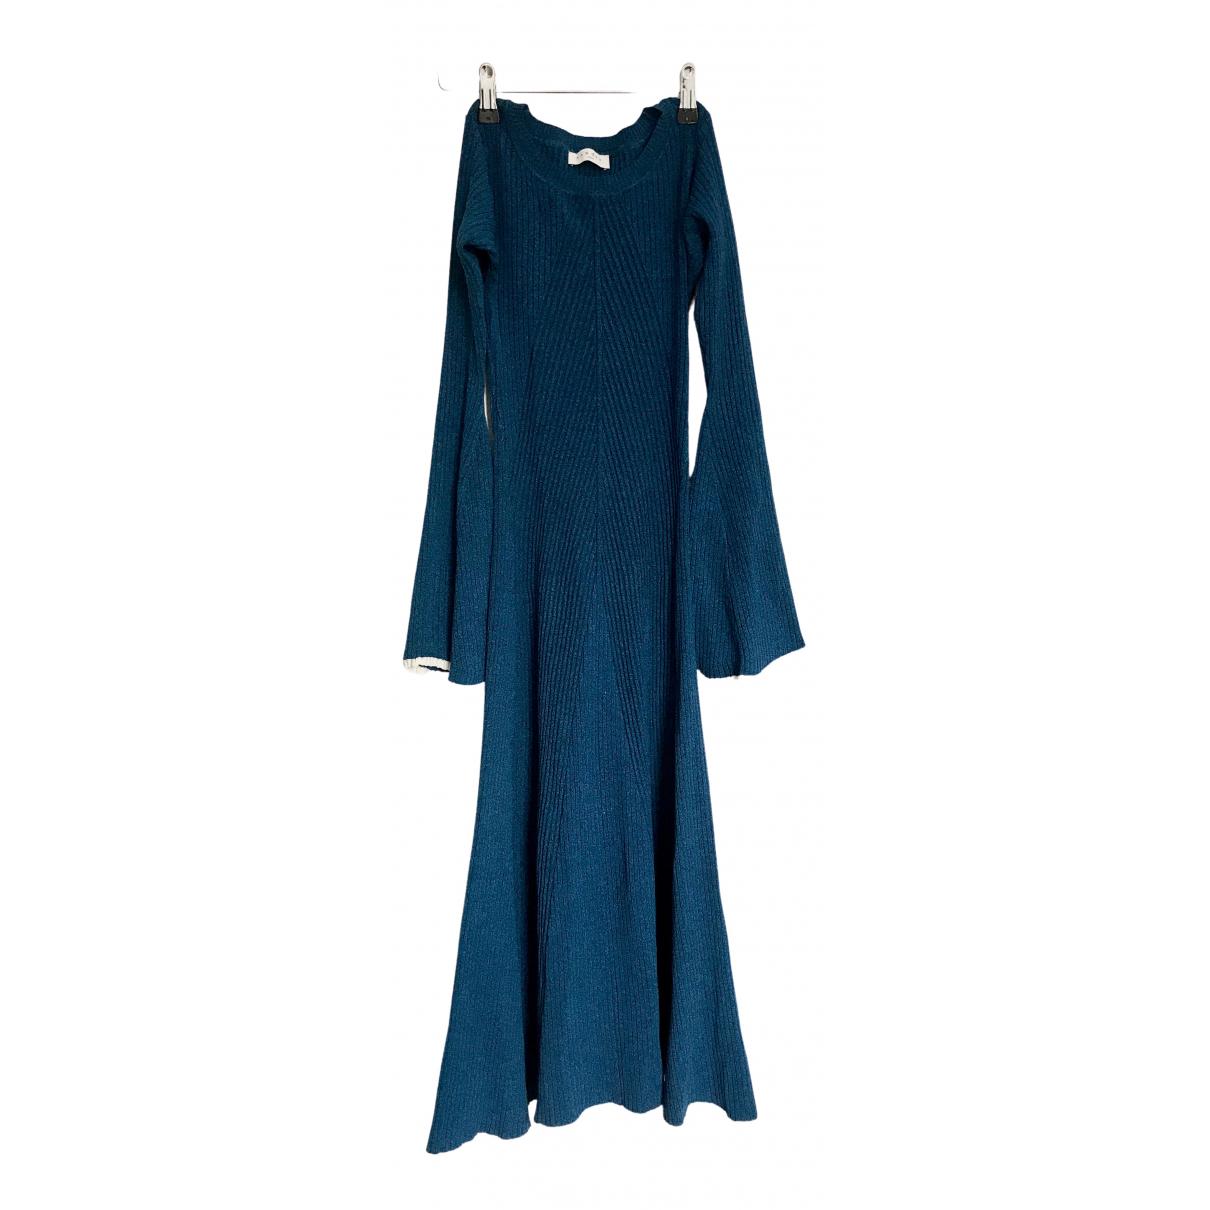 Sandro Fall Winter 2019 Kleid in  Blau Viskose